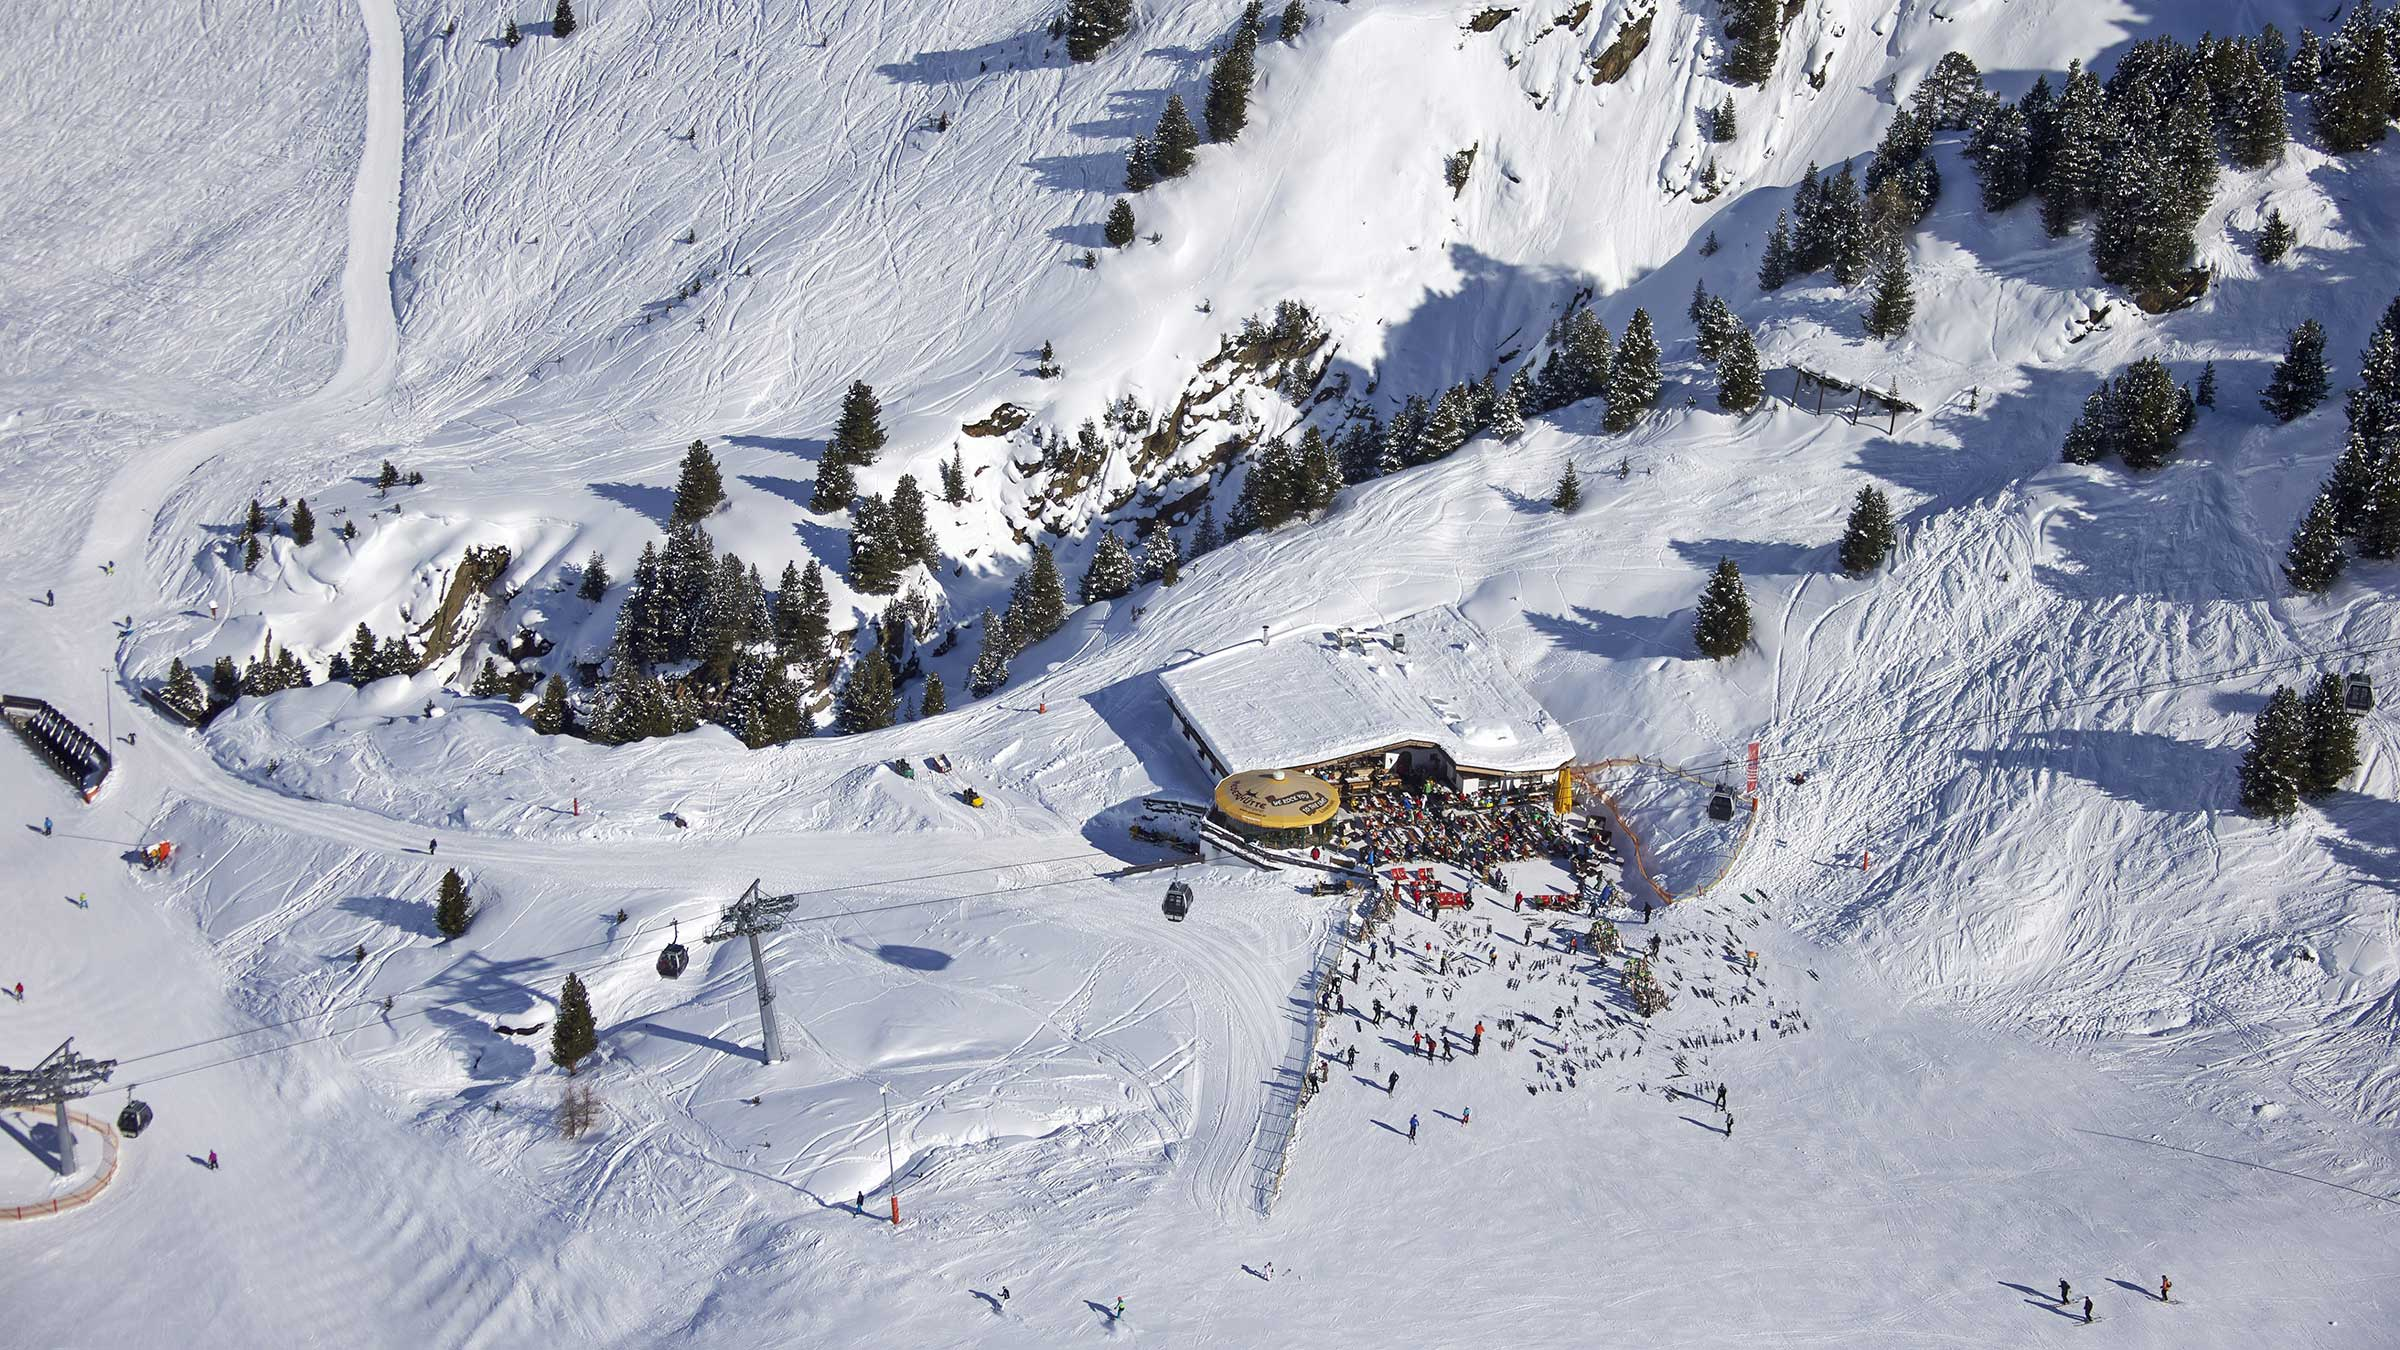 Nederhütte - Powder Snow Week Obergurgl-Hochgurgl